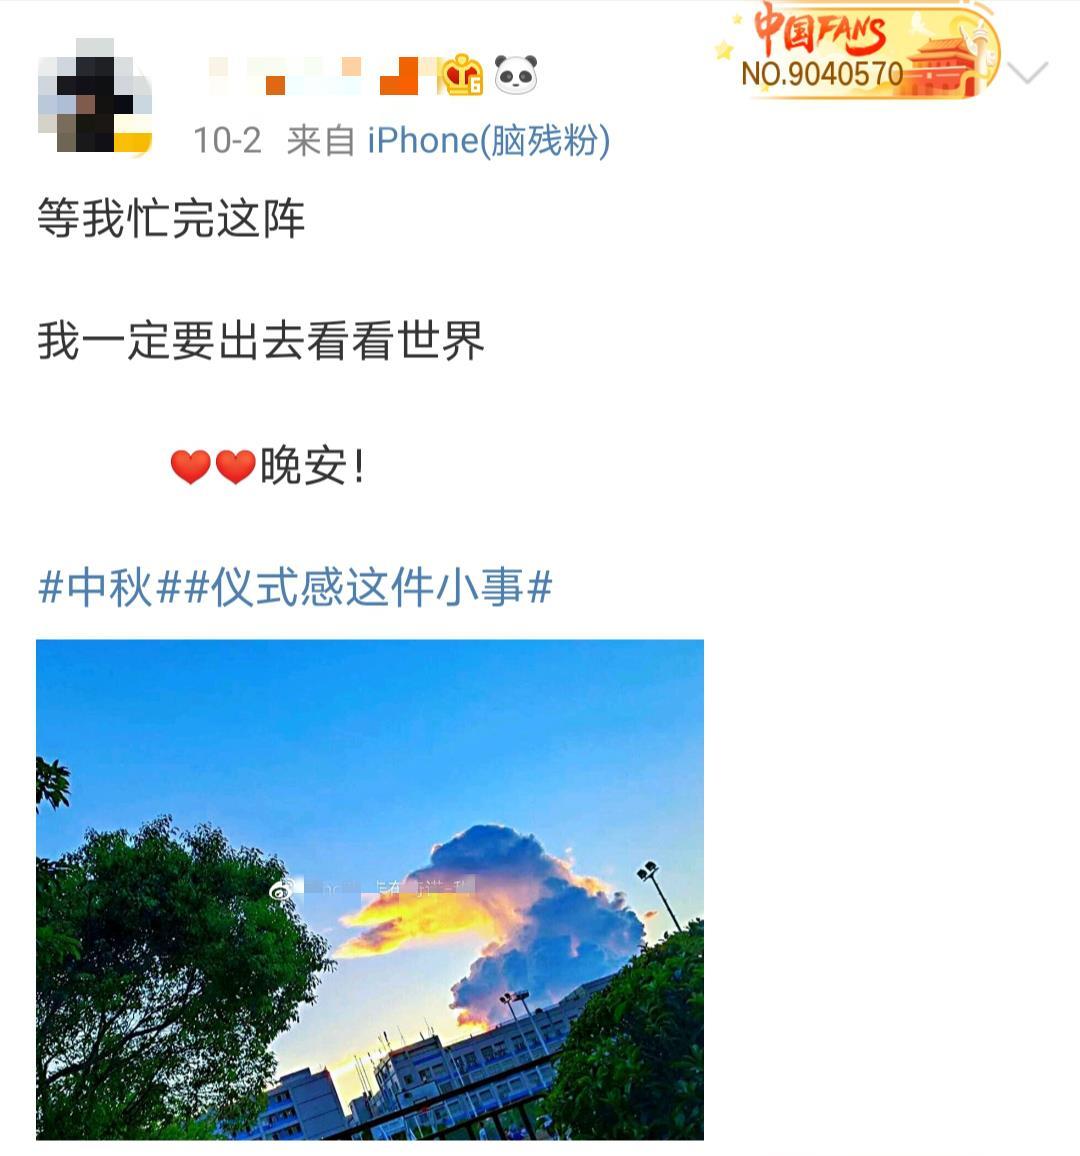 //img5.autotimes.com.cn/news/2020/10/1018_210518418841.jpg